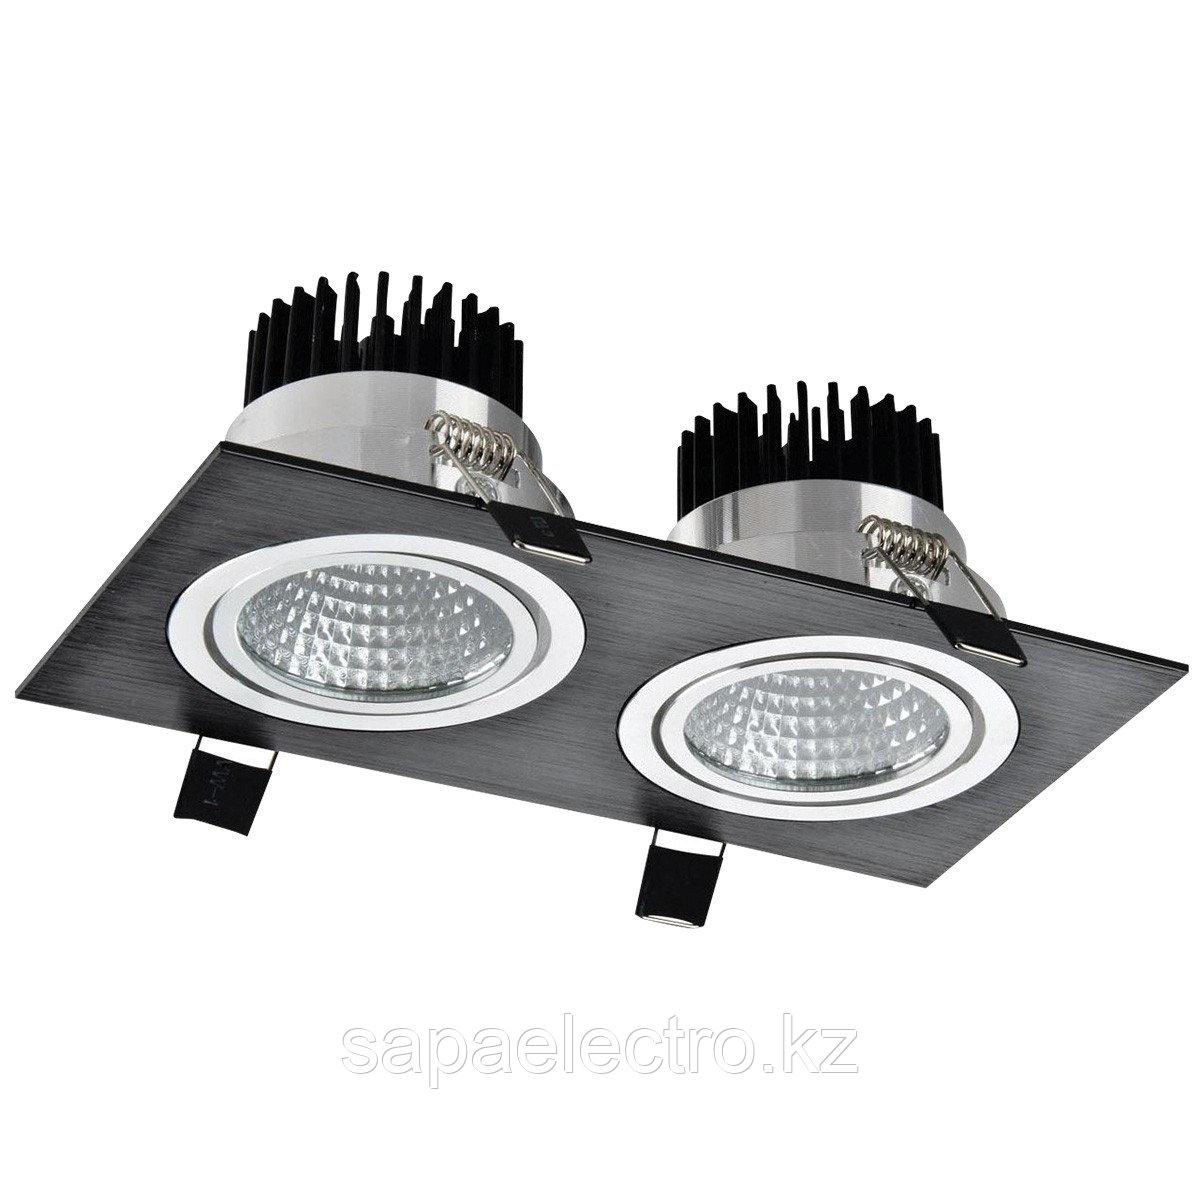 Свет-к LED OC002B 2х5W 5000K BLACK (TS) 50шт